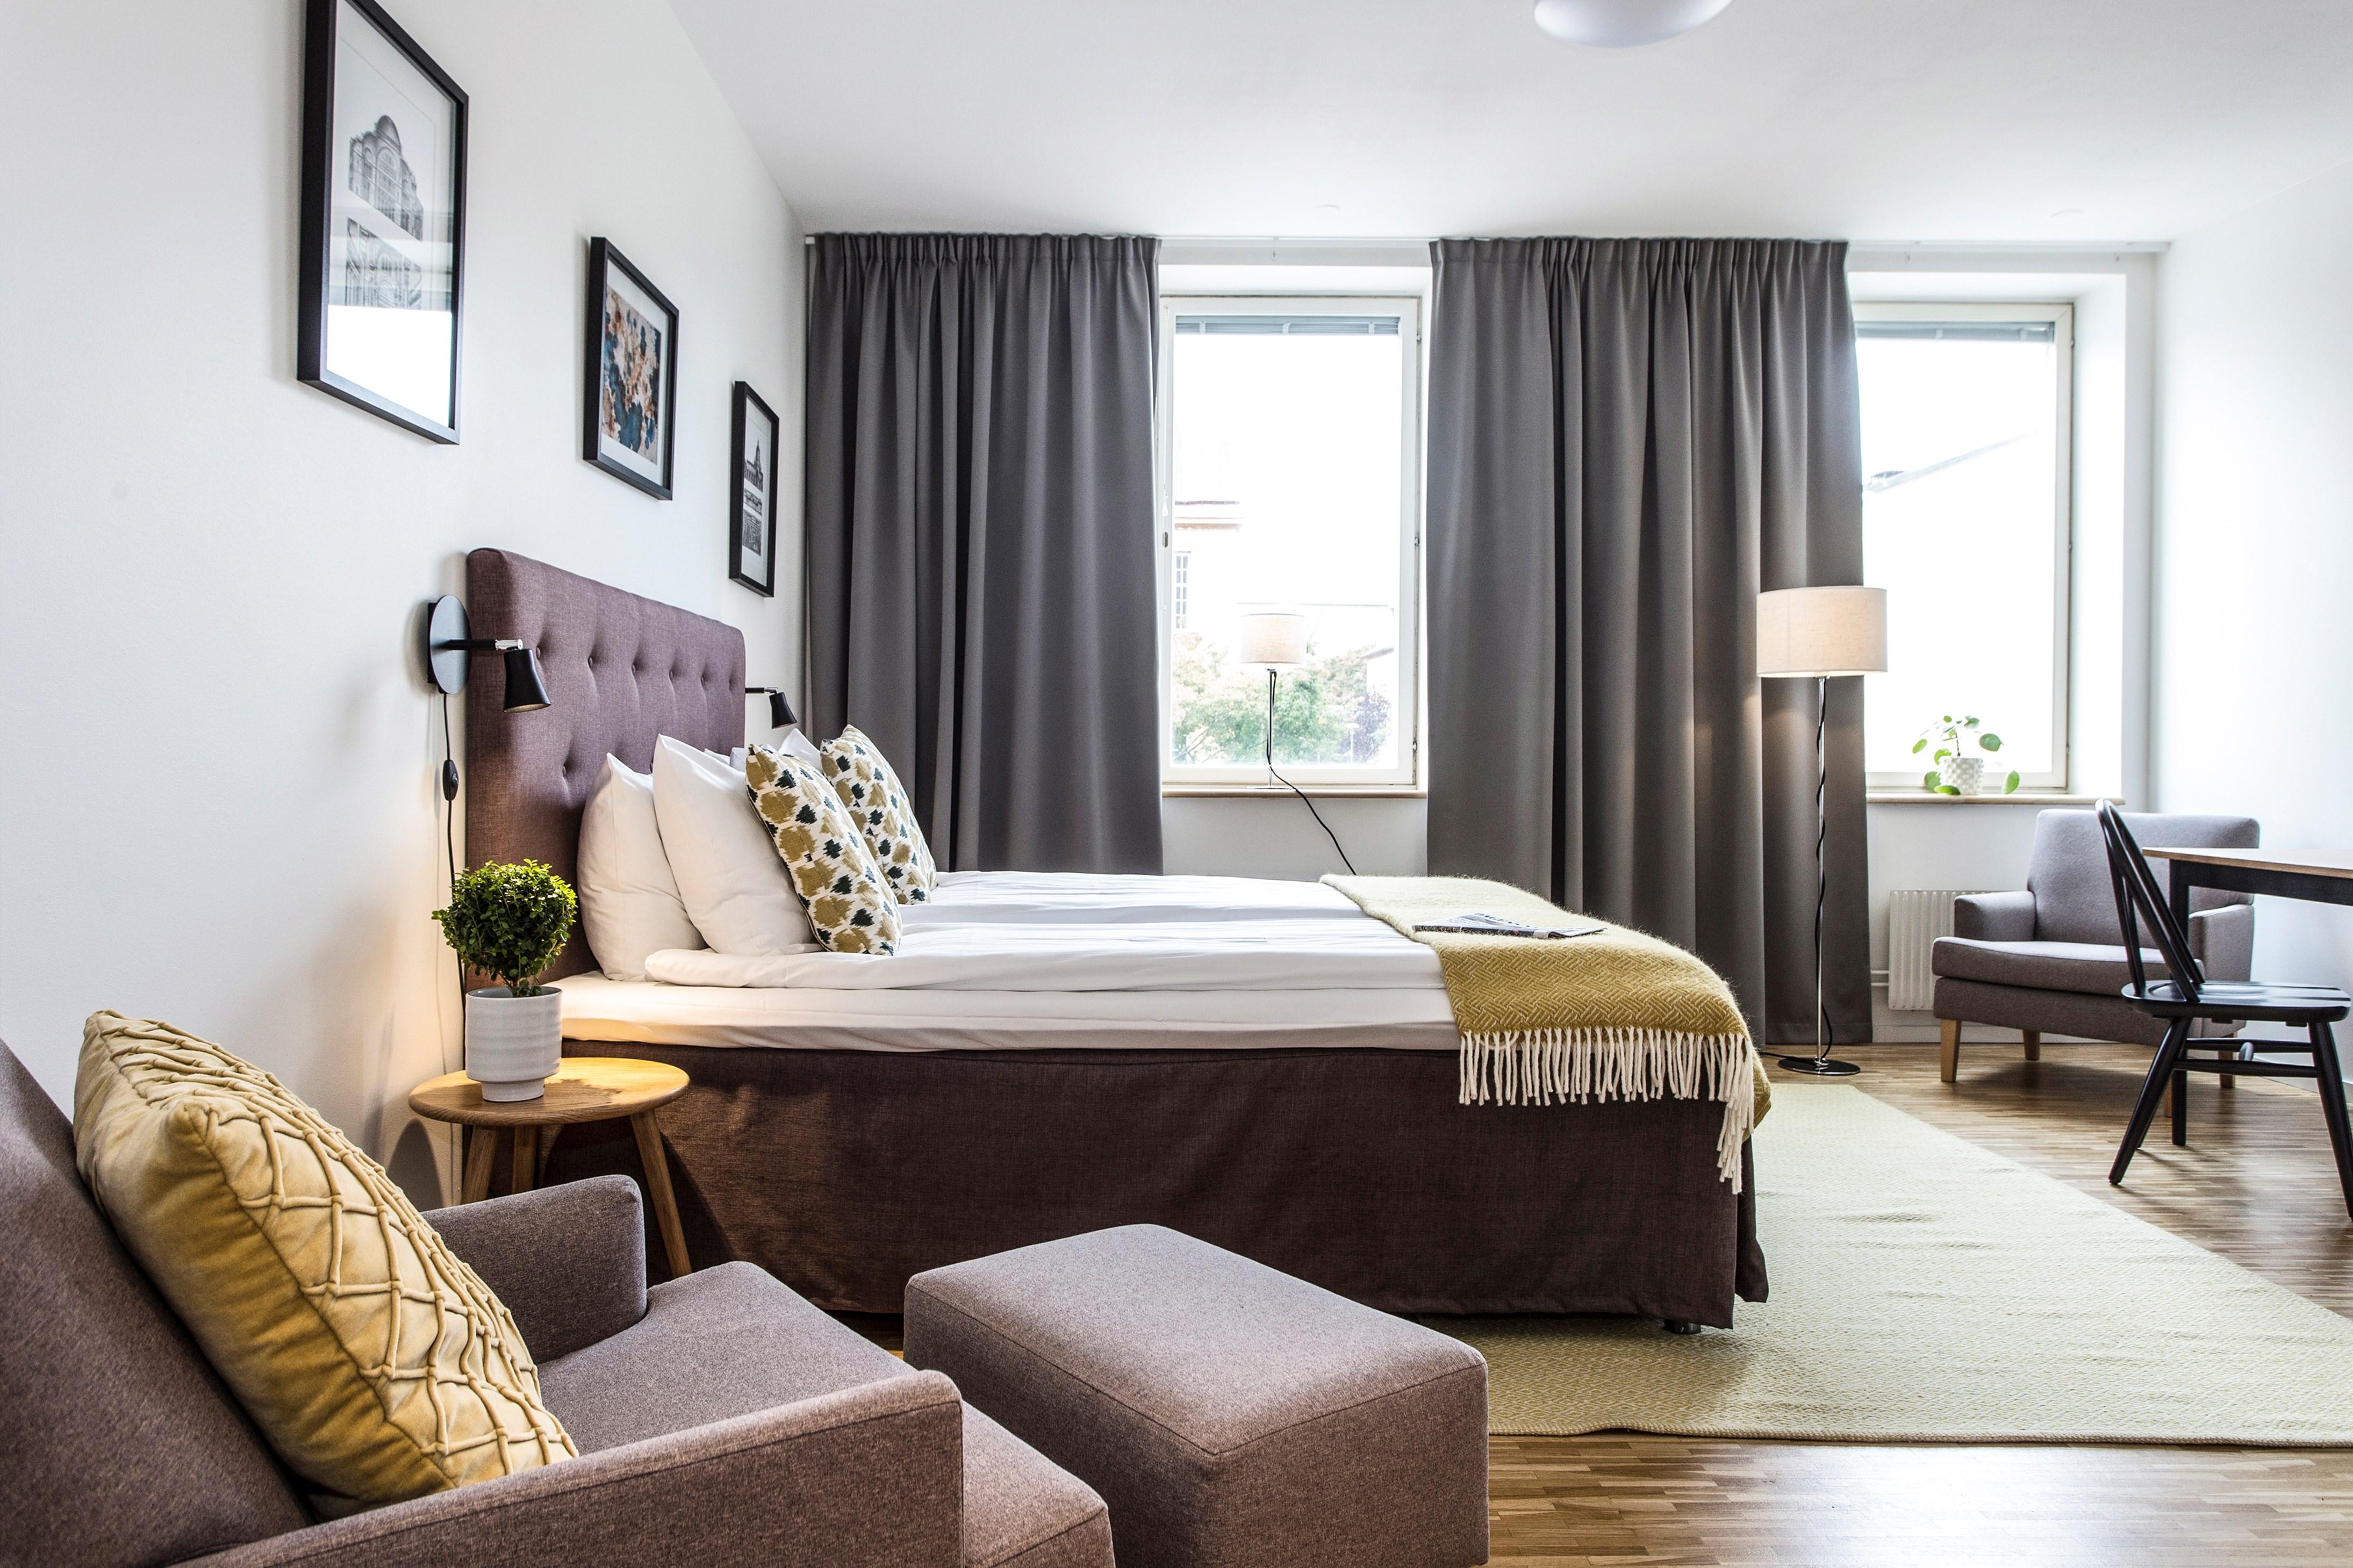 långtidsboende på hotell stockholm